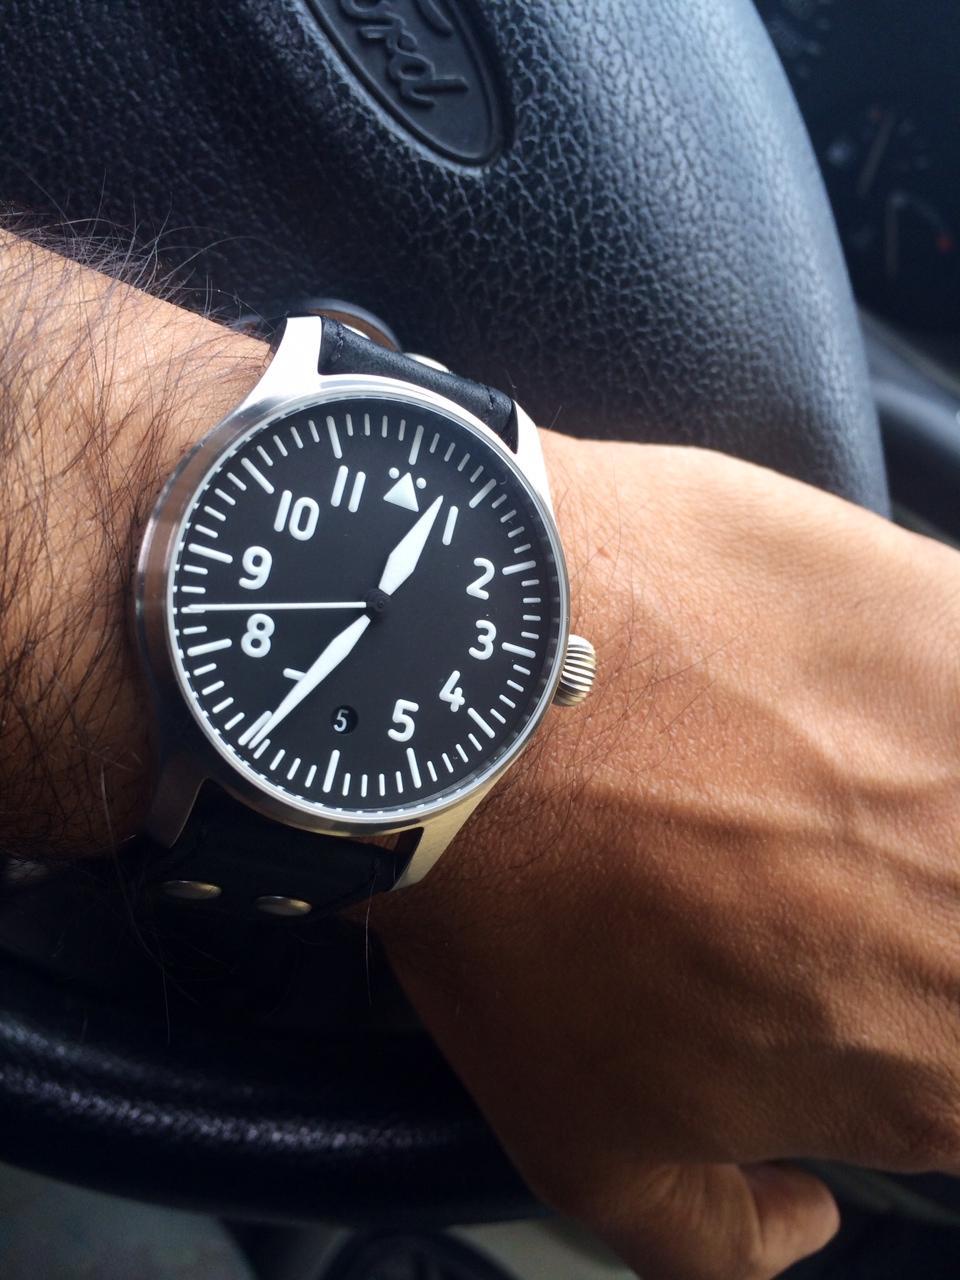 Vends - [Vends] STOWA Flieger verus Verus110